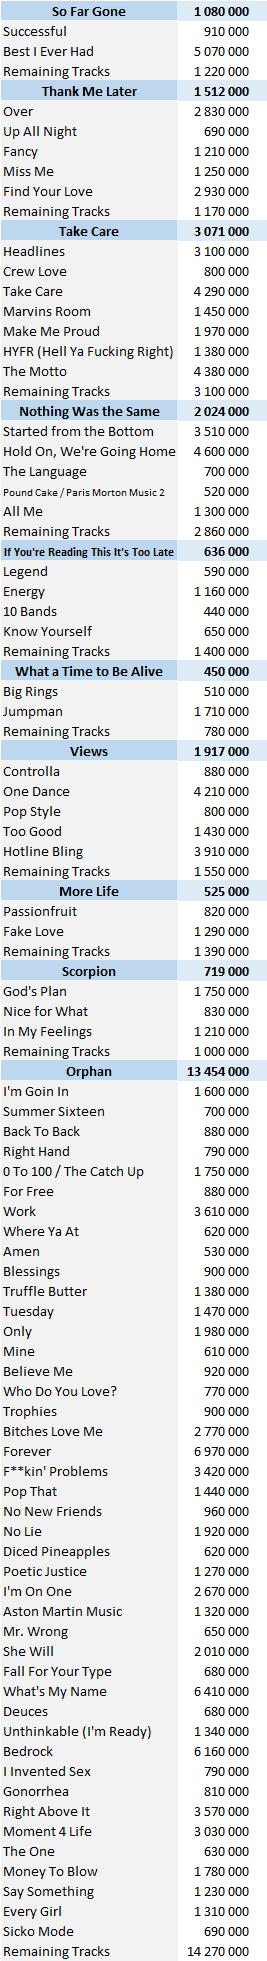 CSPC Drake digital singles sales